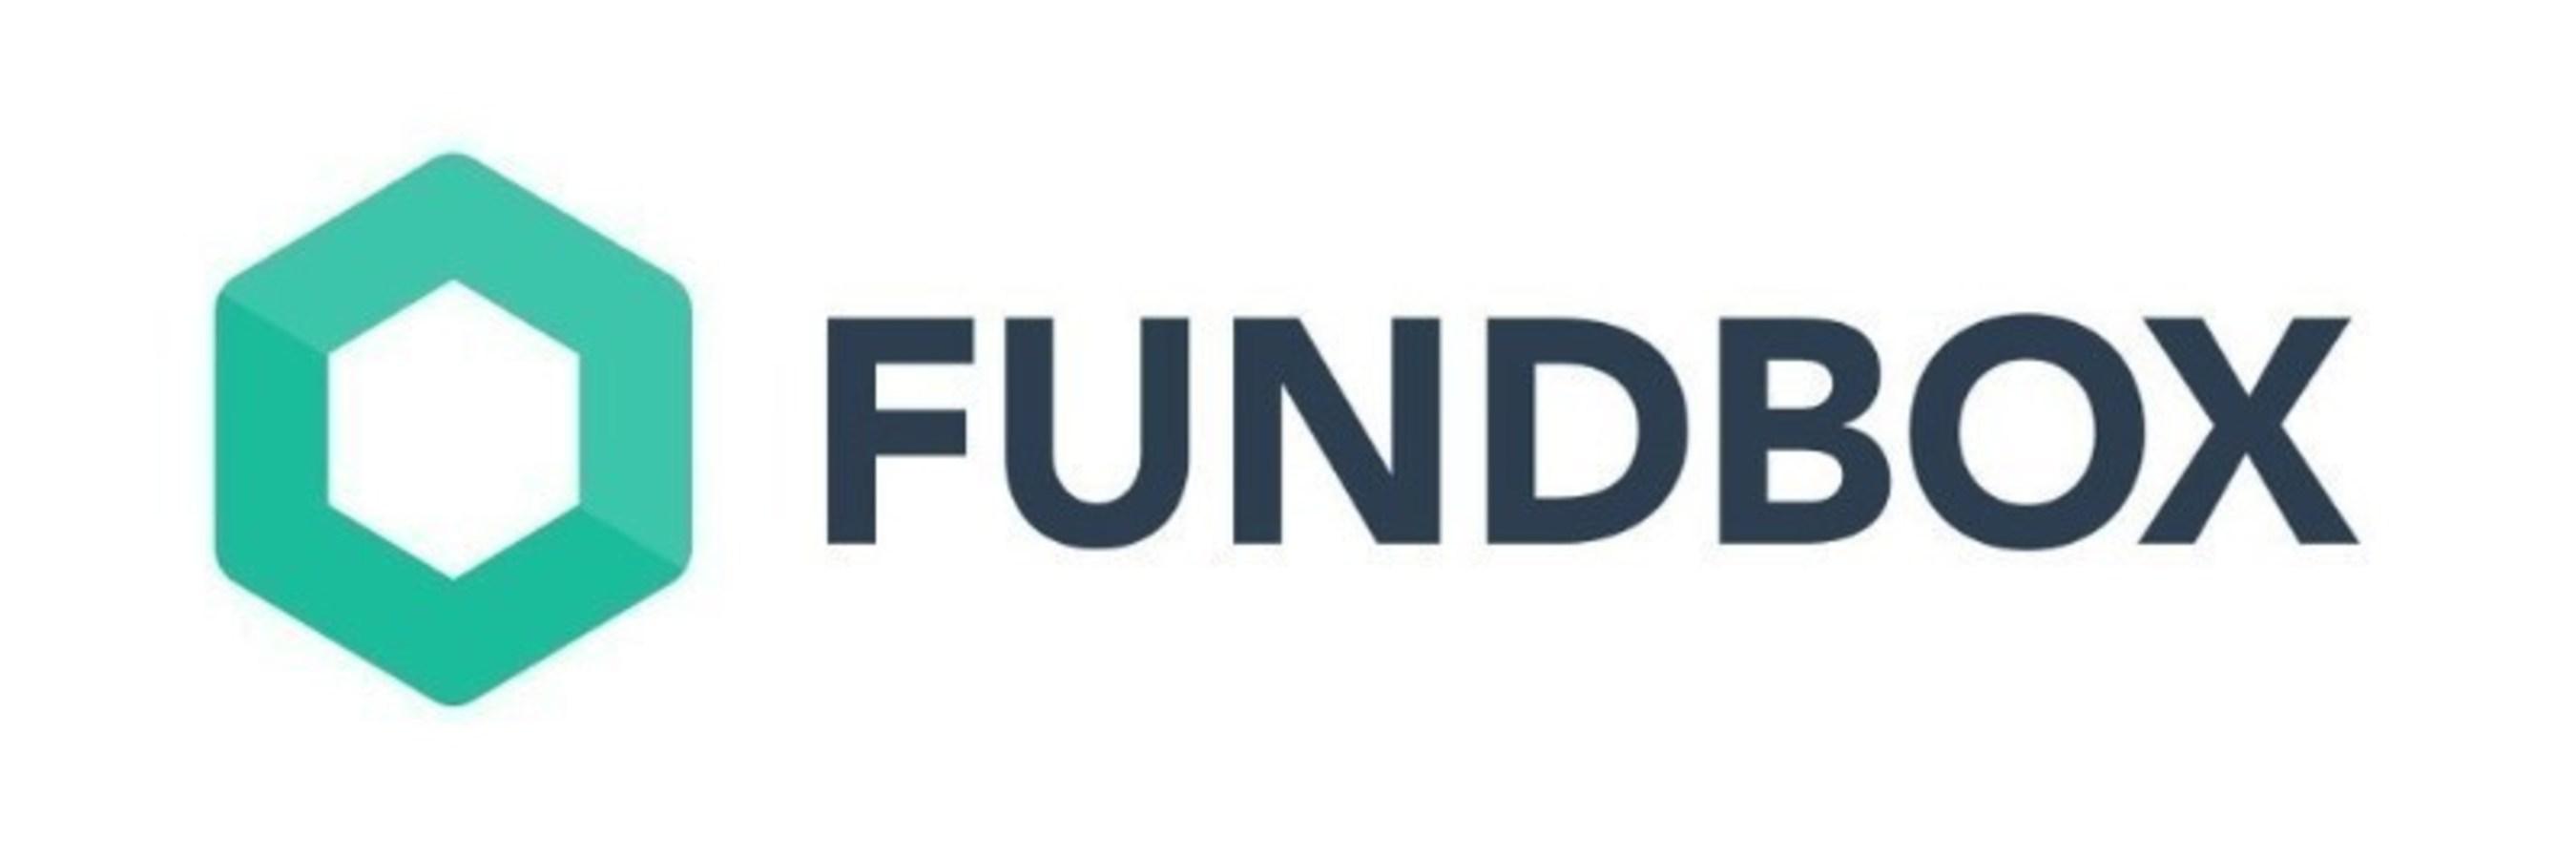 Goldman Sachs Recognizes Fundbox Founder and CEO Eyal Shinar